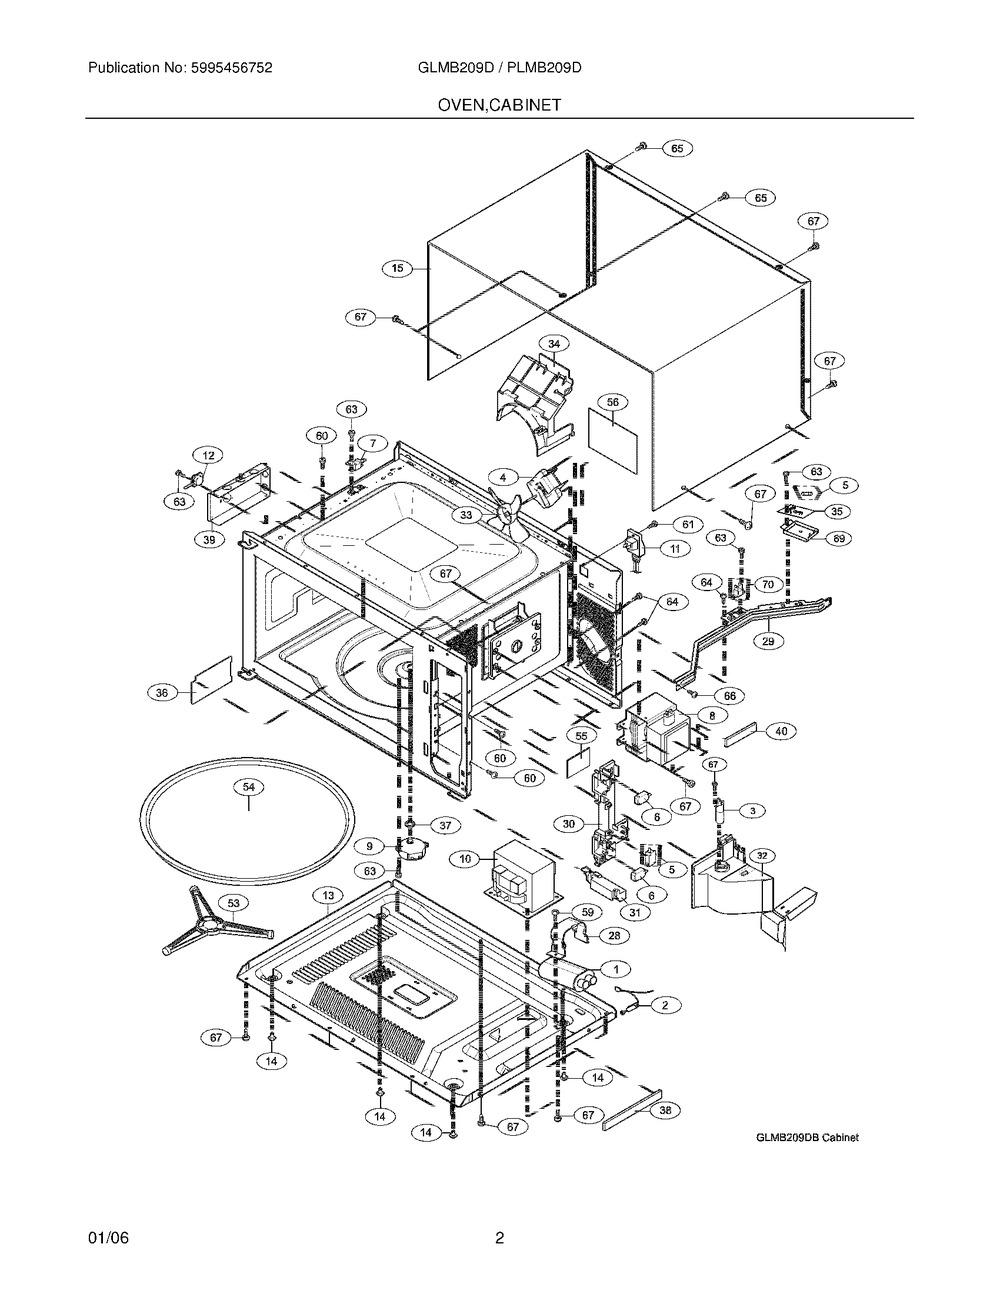 Diagram for GLMB209DSB